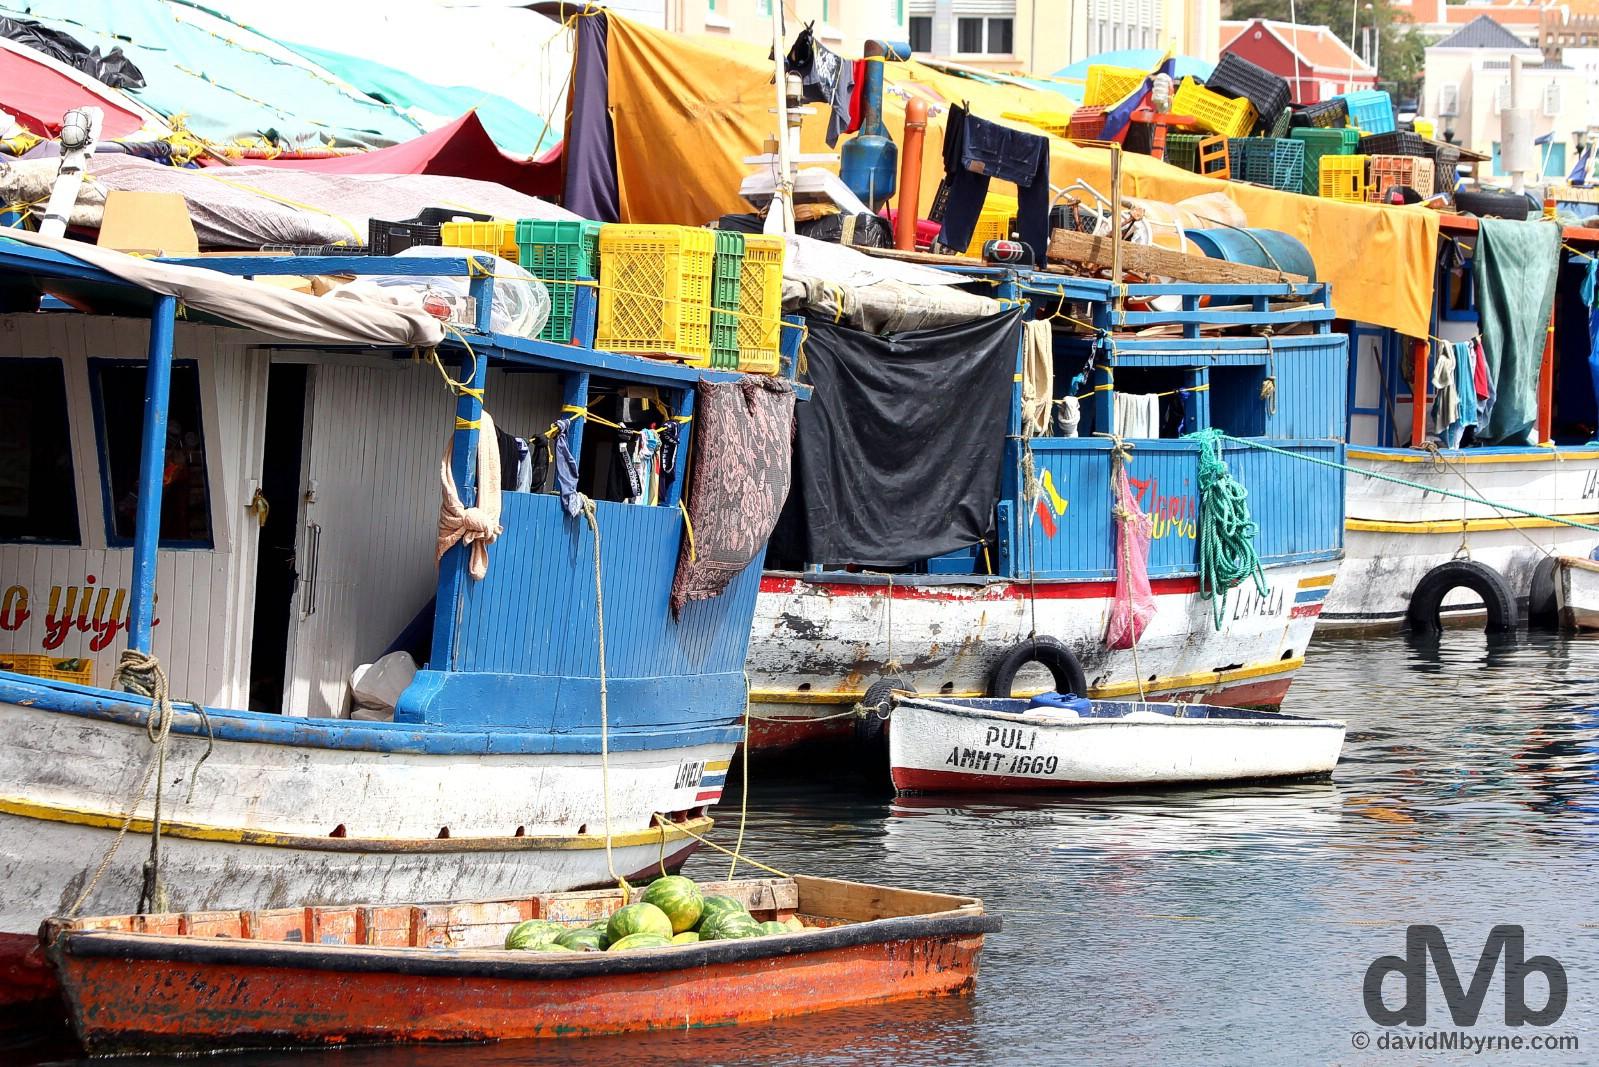 The Floating market in Willemstad, Curacao, Lesser Antilles. June 20, 2015.